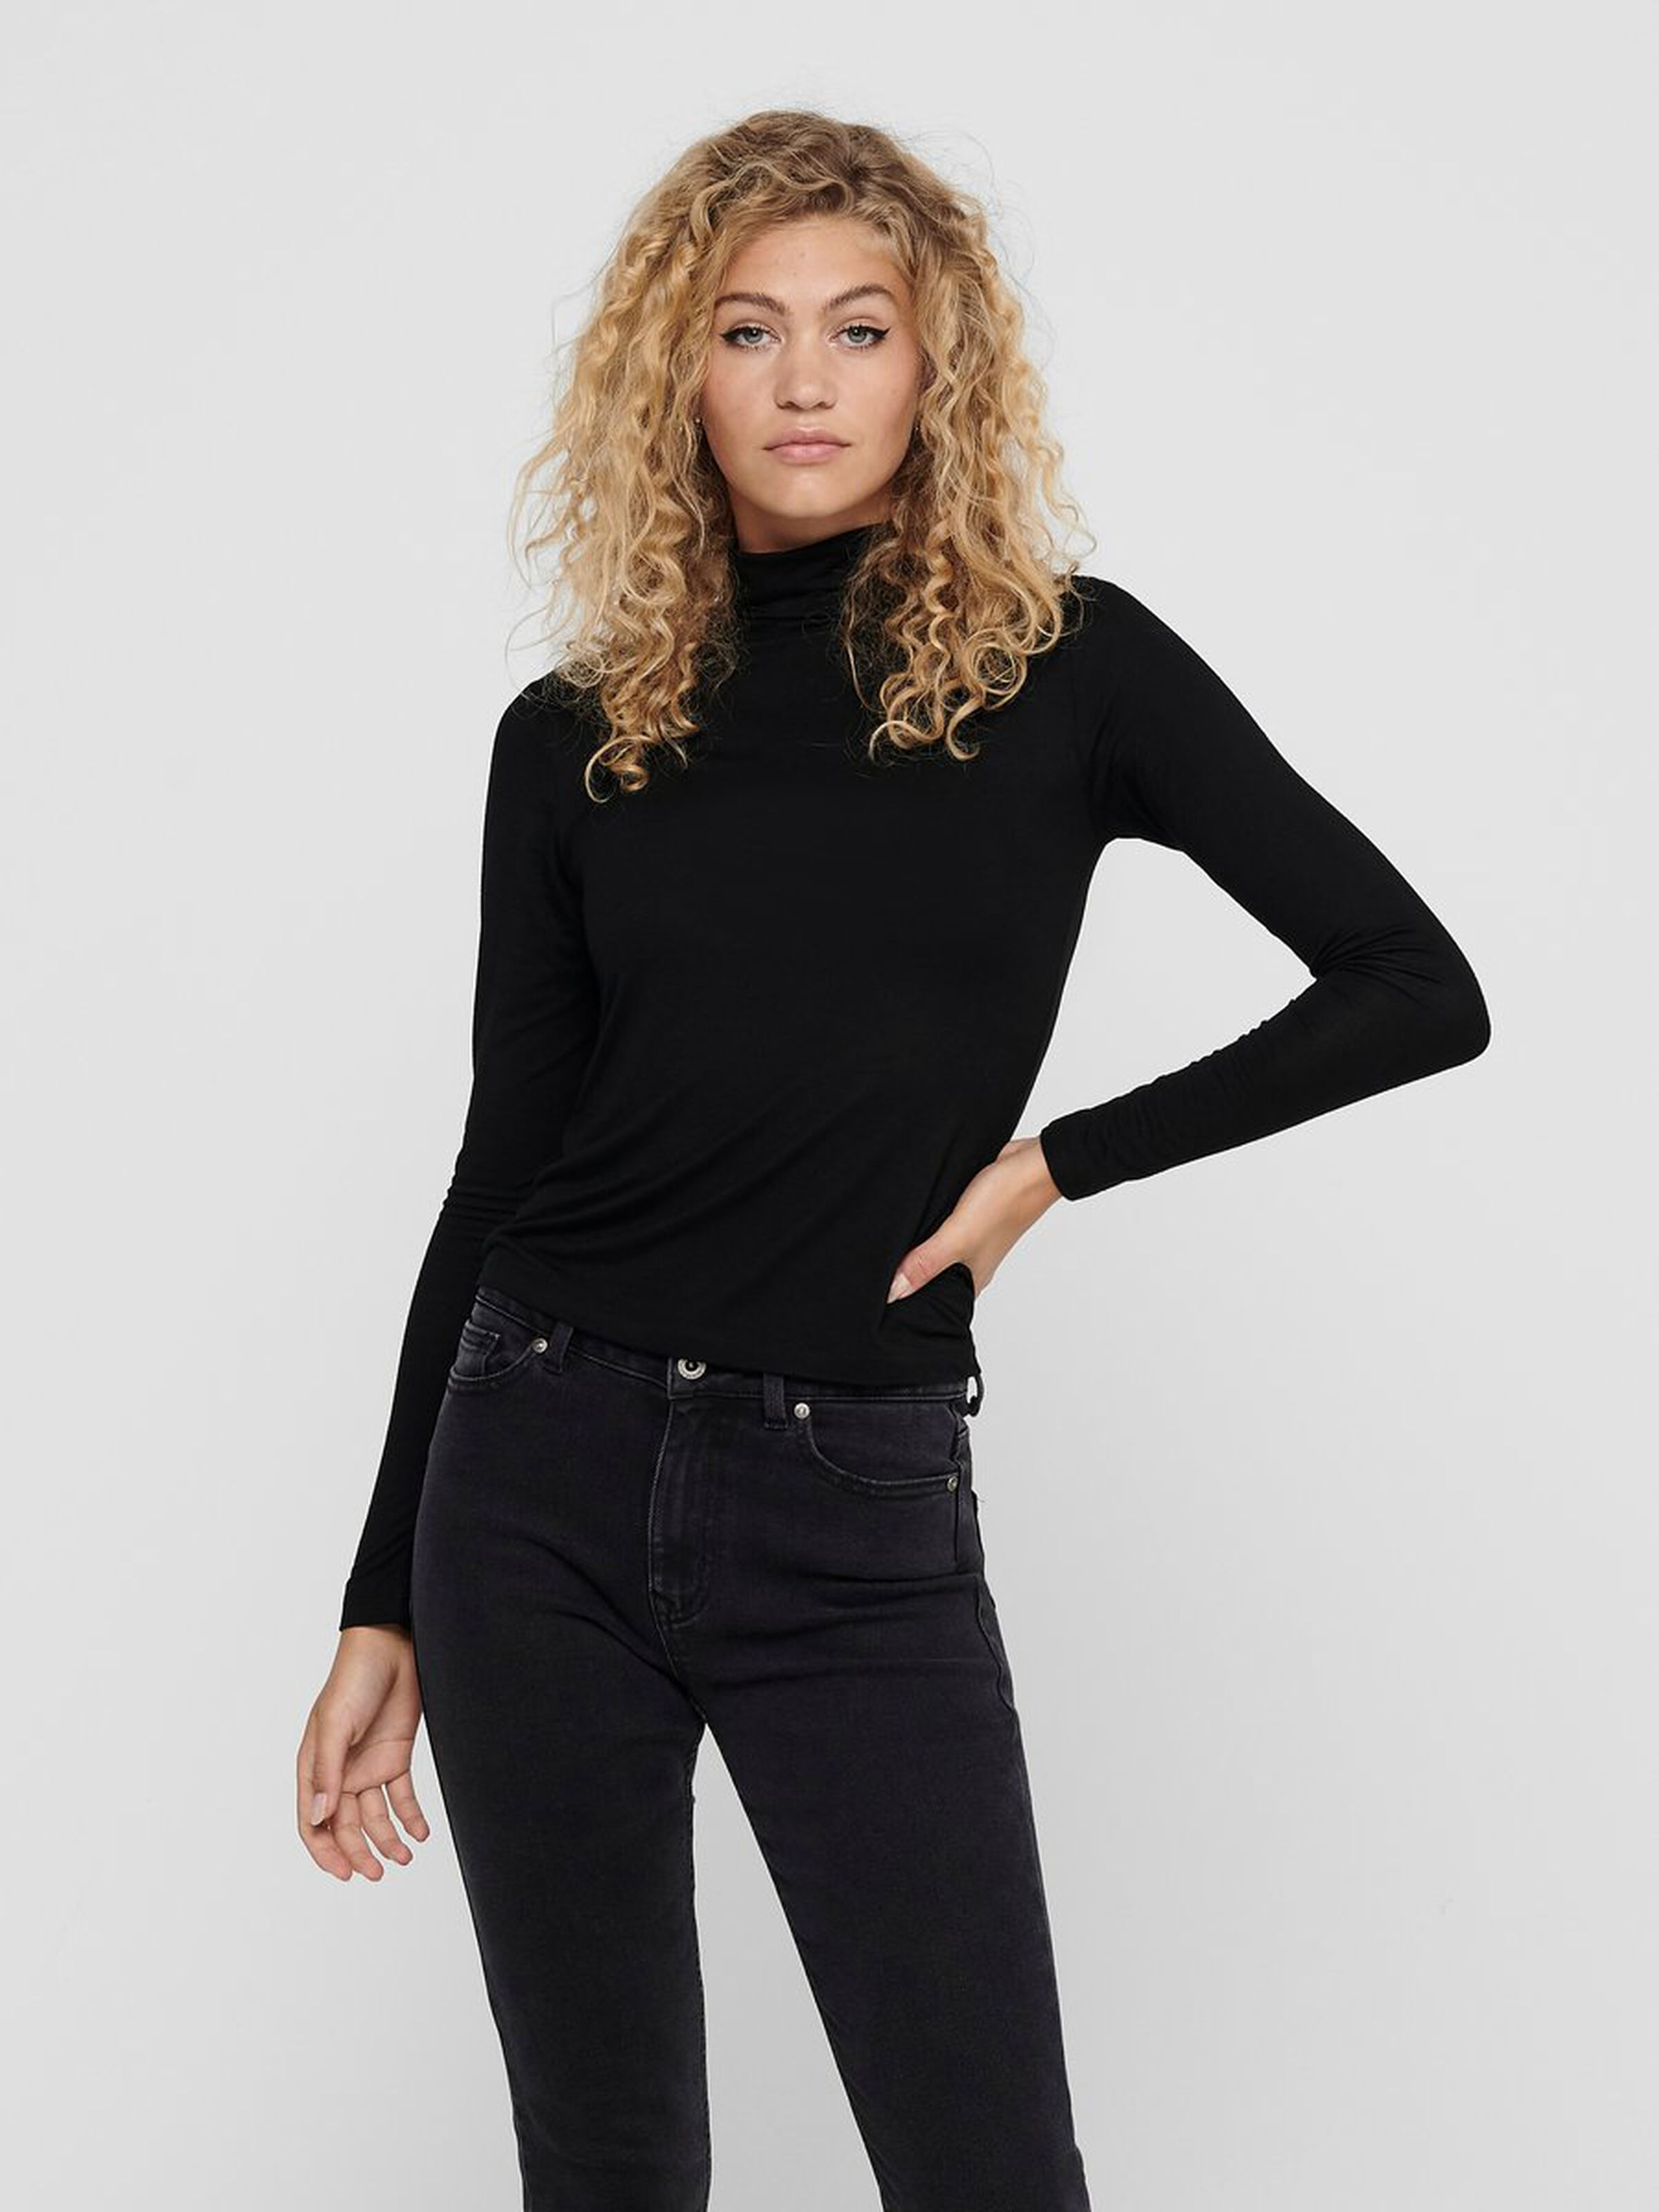 Only Lela High Neck top, black, medium